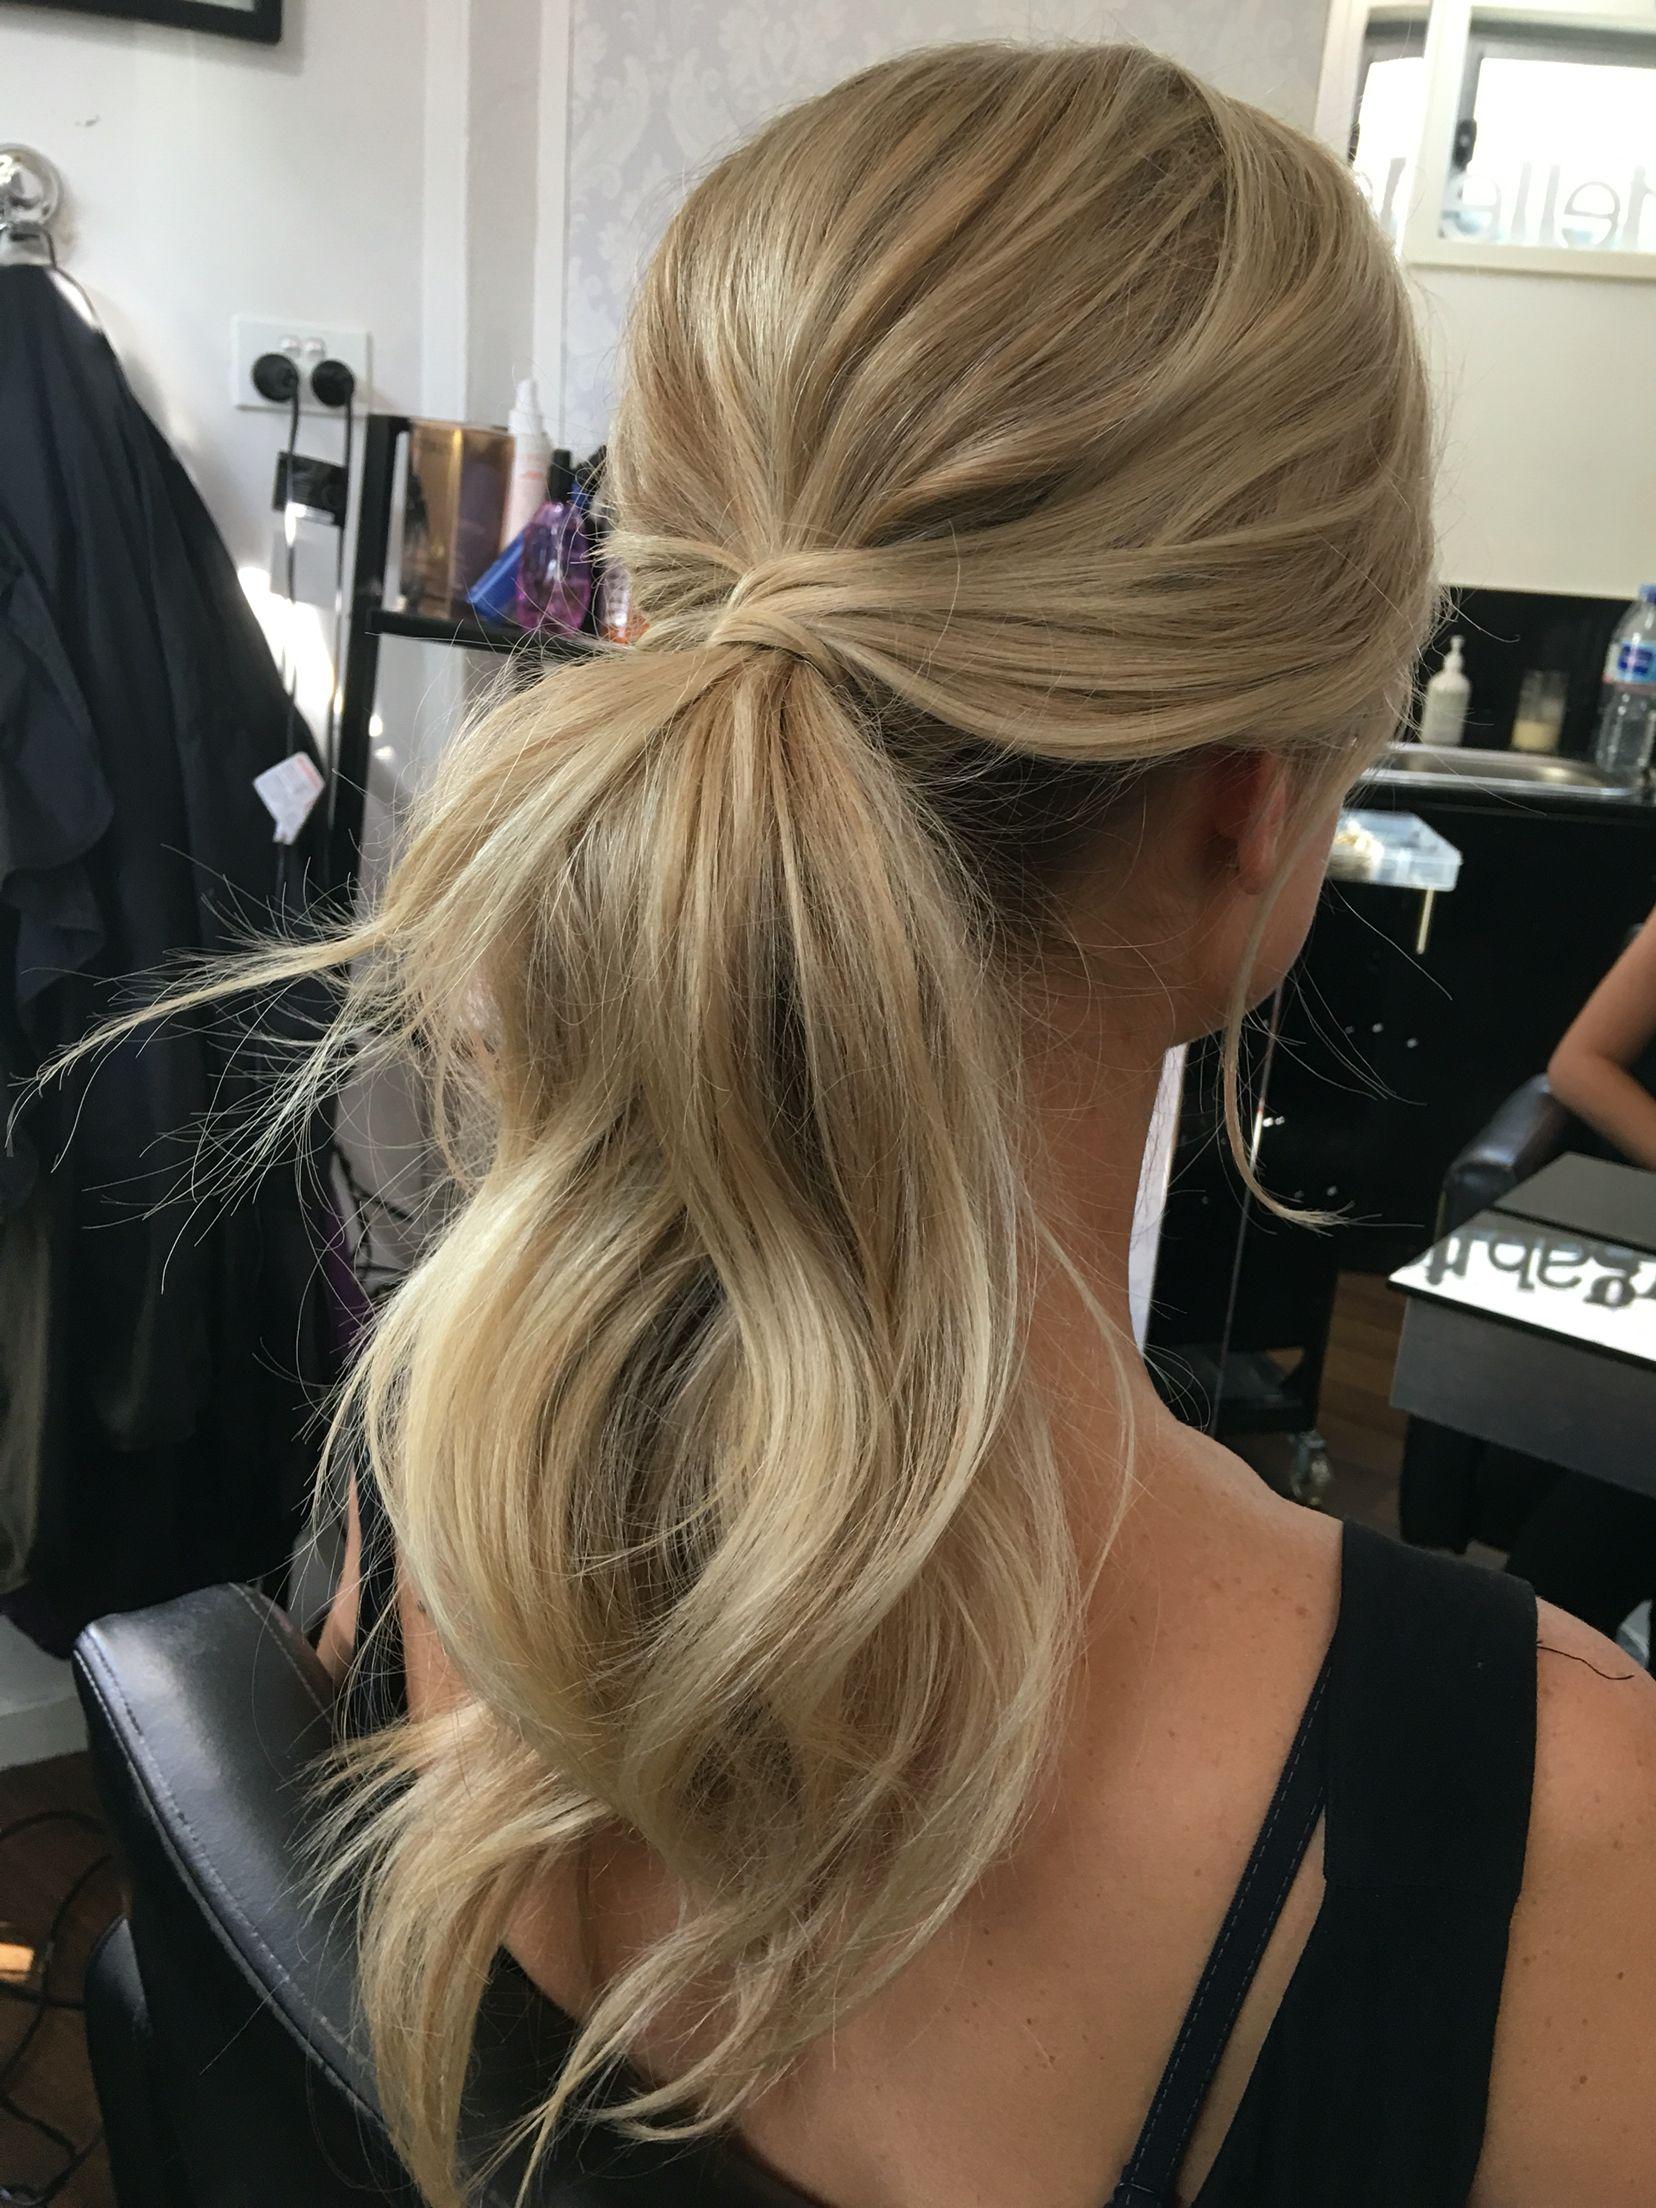 Wedding hairstyles hairstyles pinterest Μαλλιά Όμορφα μαλλιά